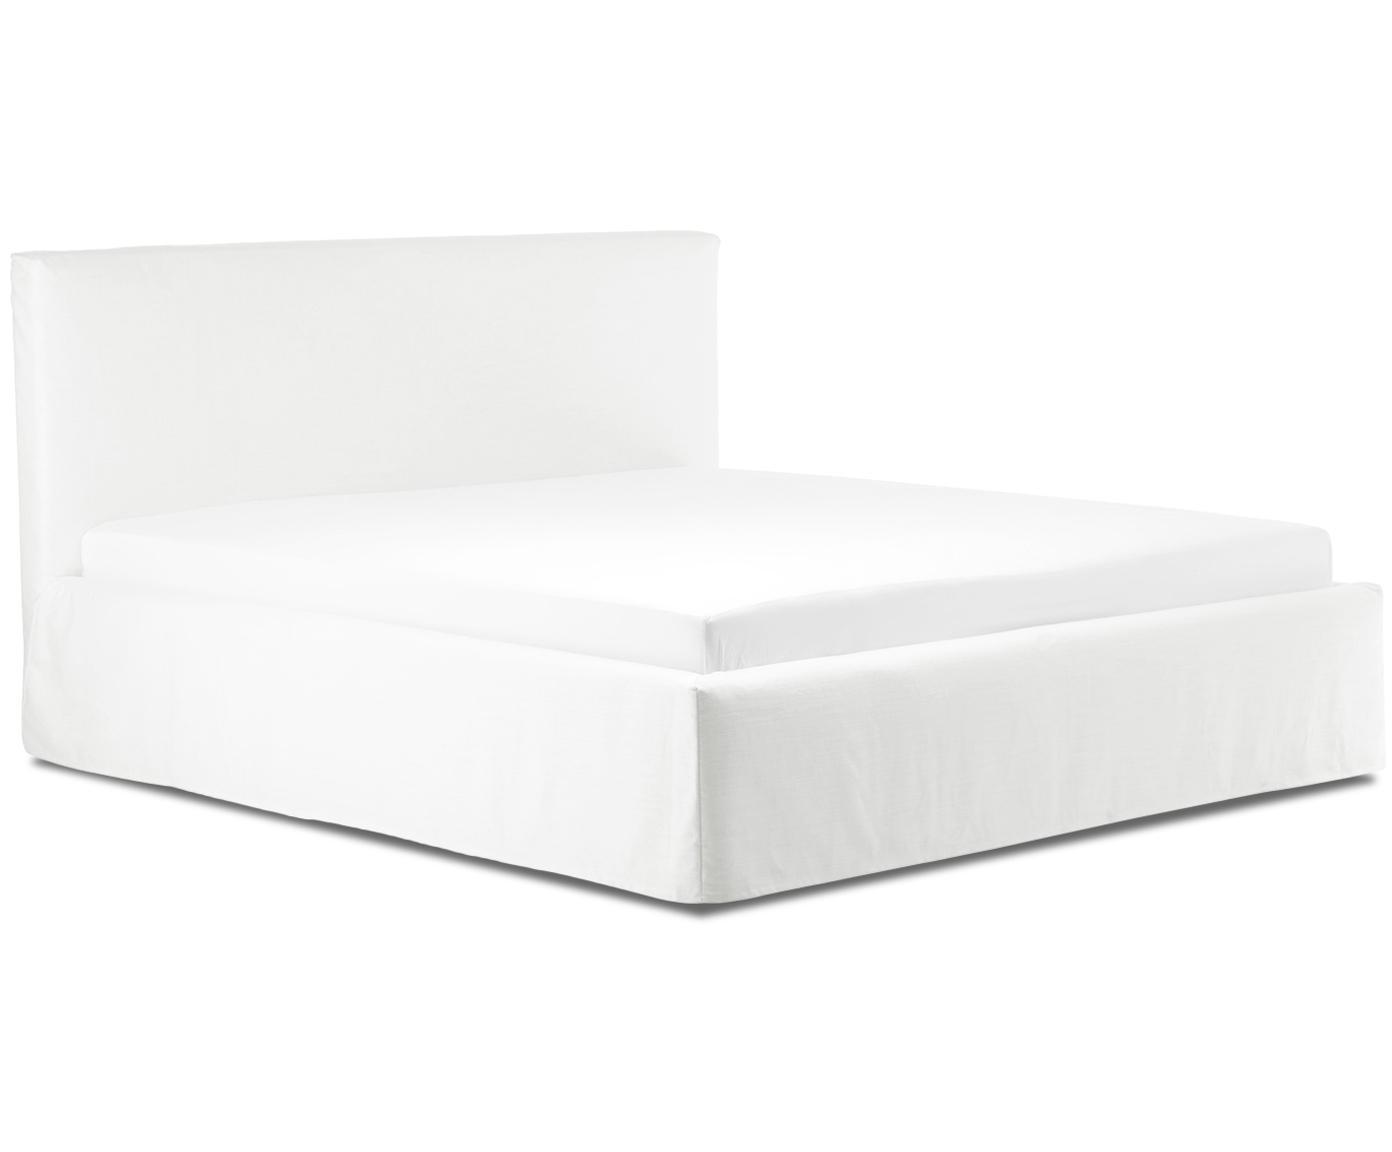 Gestoffeerd bed Feather met opbergfunctie, Frame: massief grenenhout, Bekleding: polyester (structuurmater, Crèmewit, 160 x 200 cm